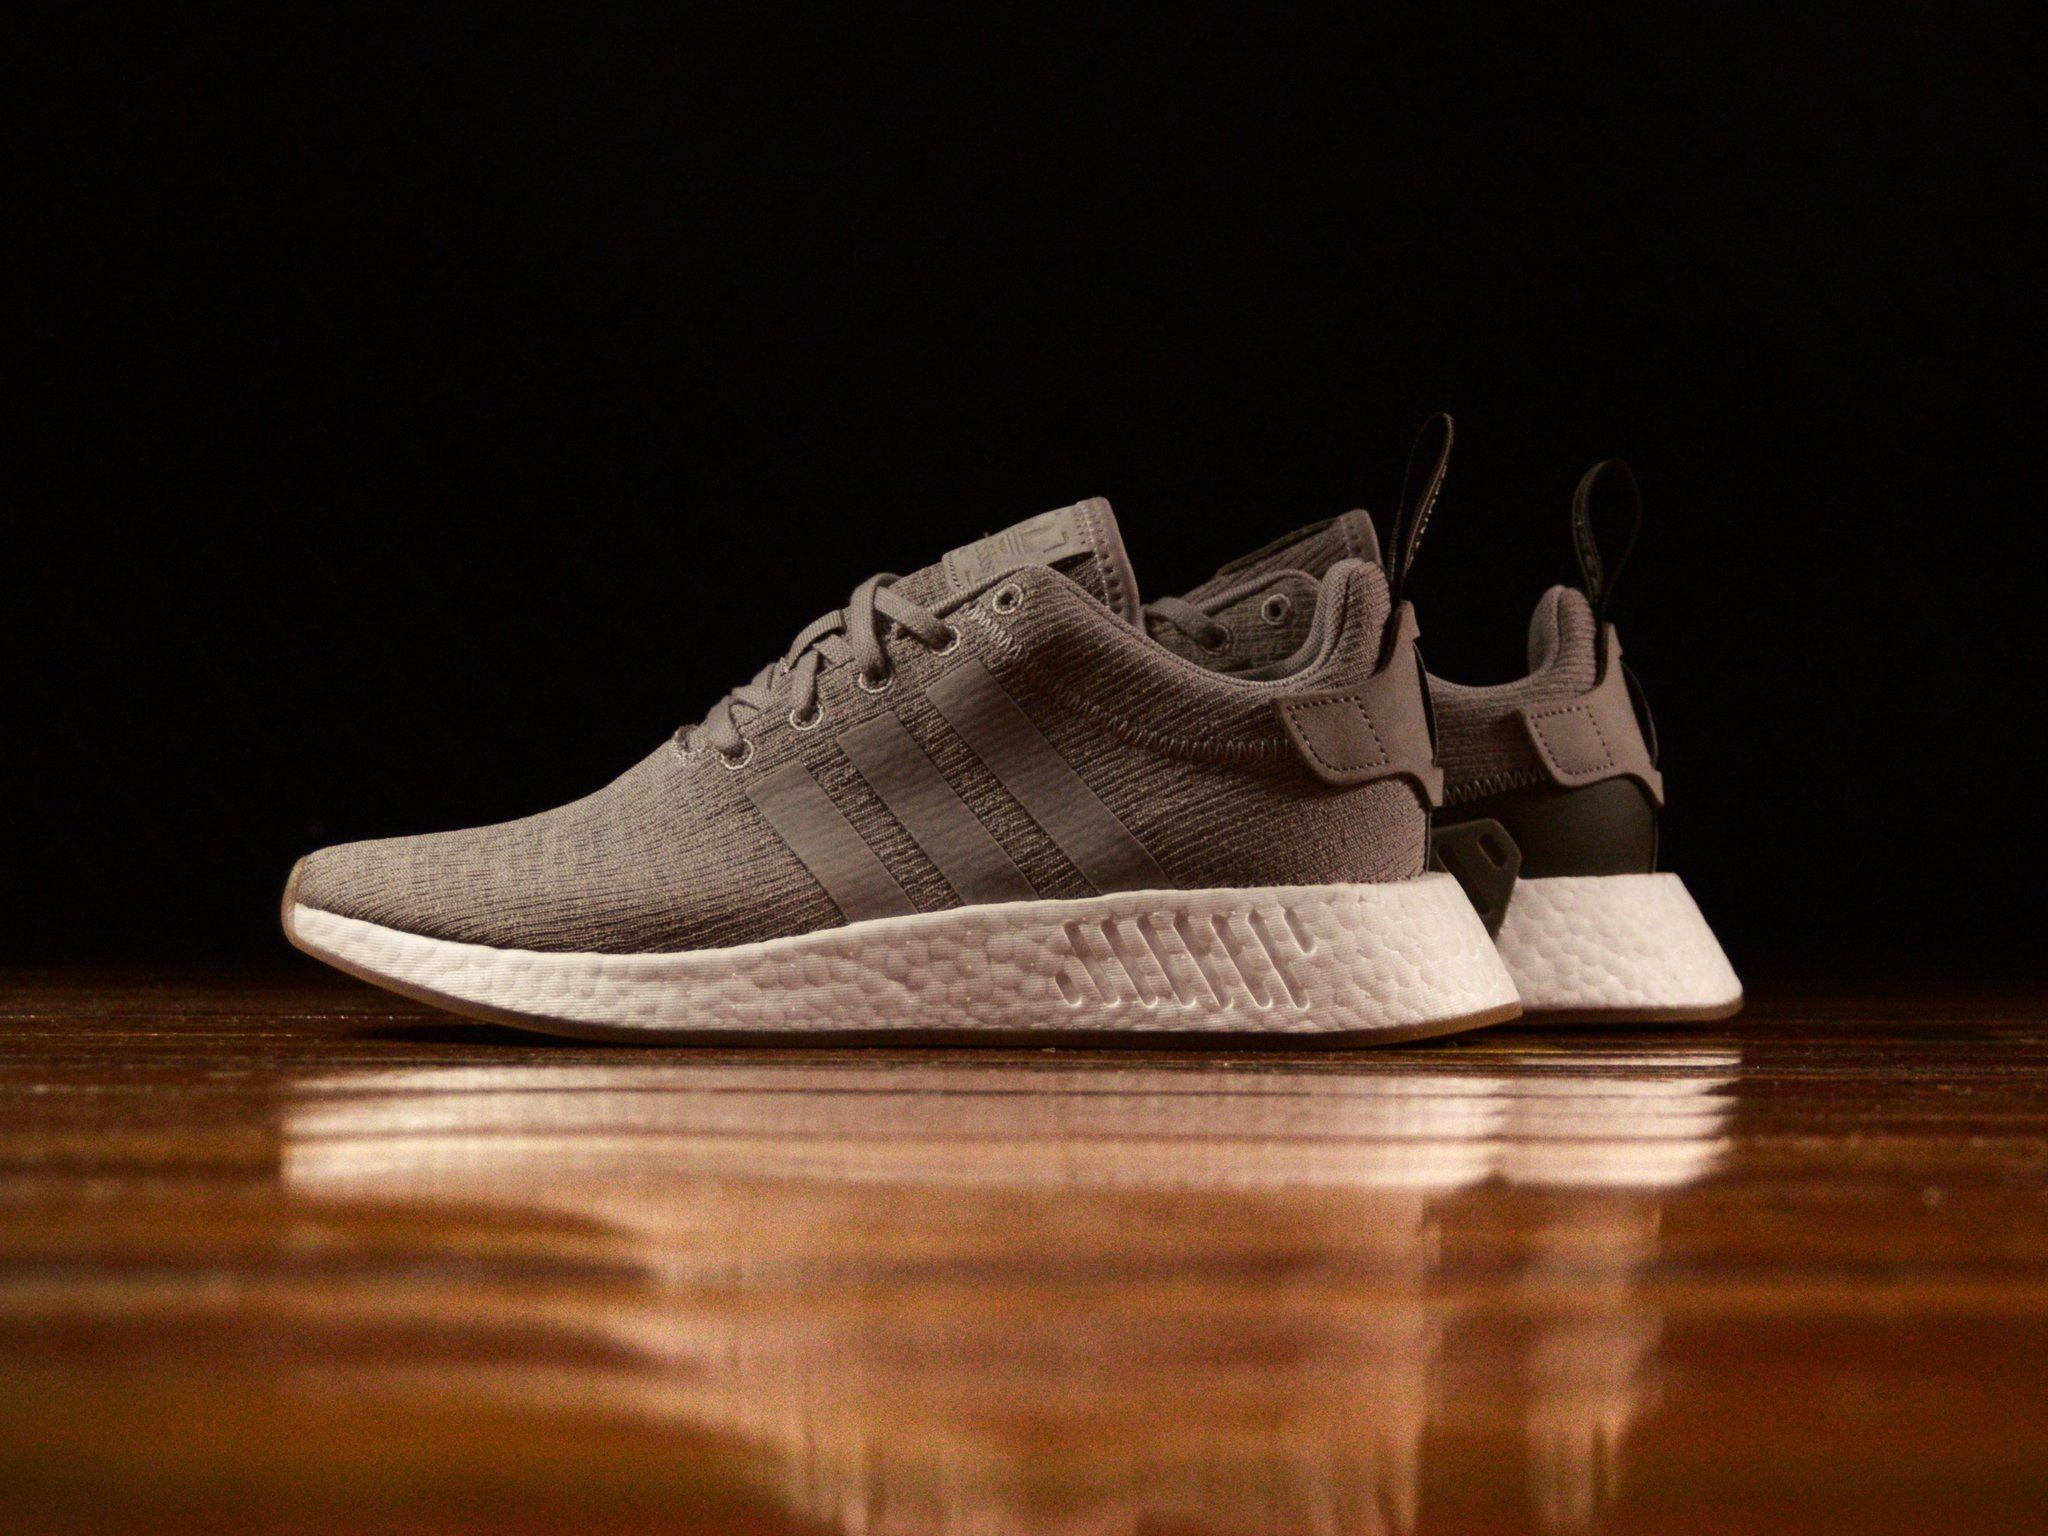 wholesale dealer 3e62a 3bfca Men's Adidas NMD R2 [CQ2399] | Adidas | Adidas, Adidas nmd ...